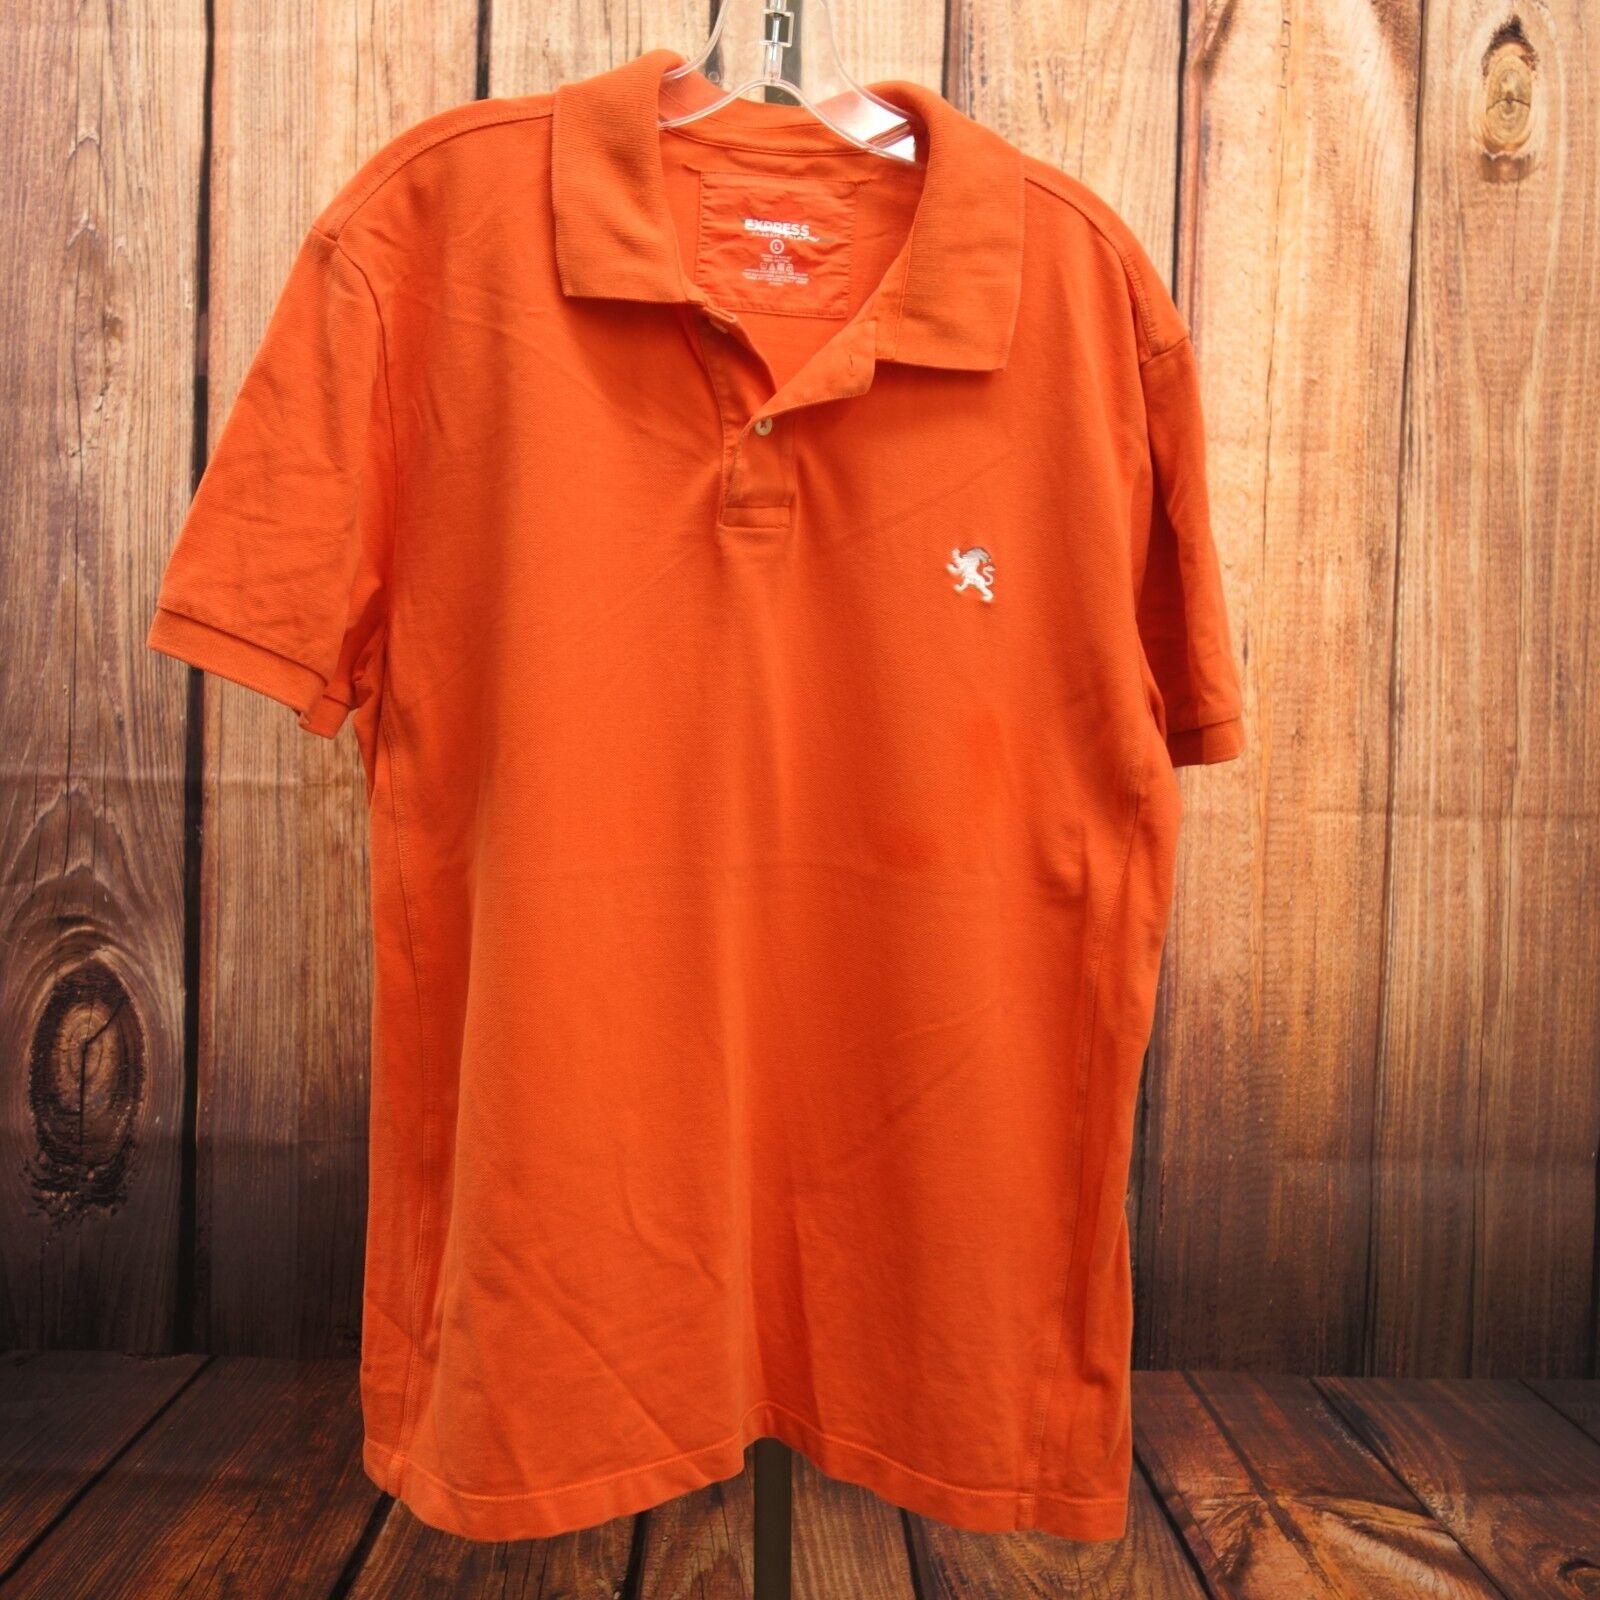 New Express Mens orange White Lion Short Sleeve Classic Polo Shirt Size L